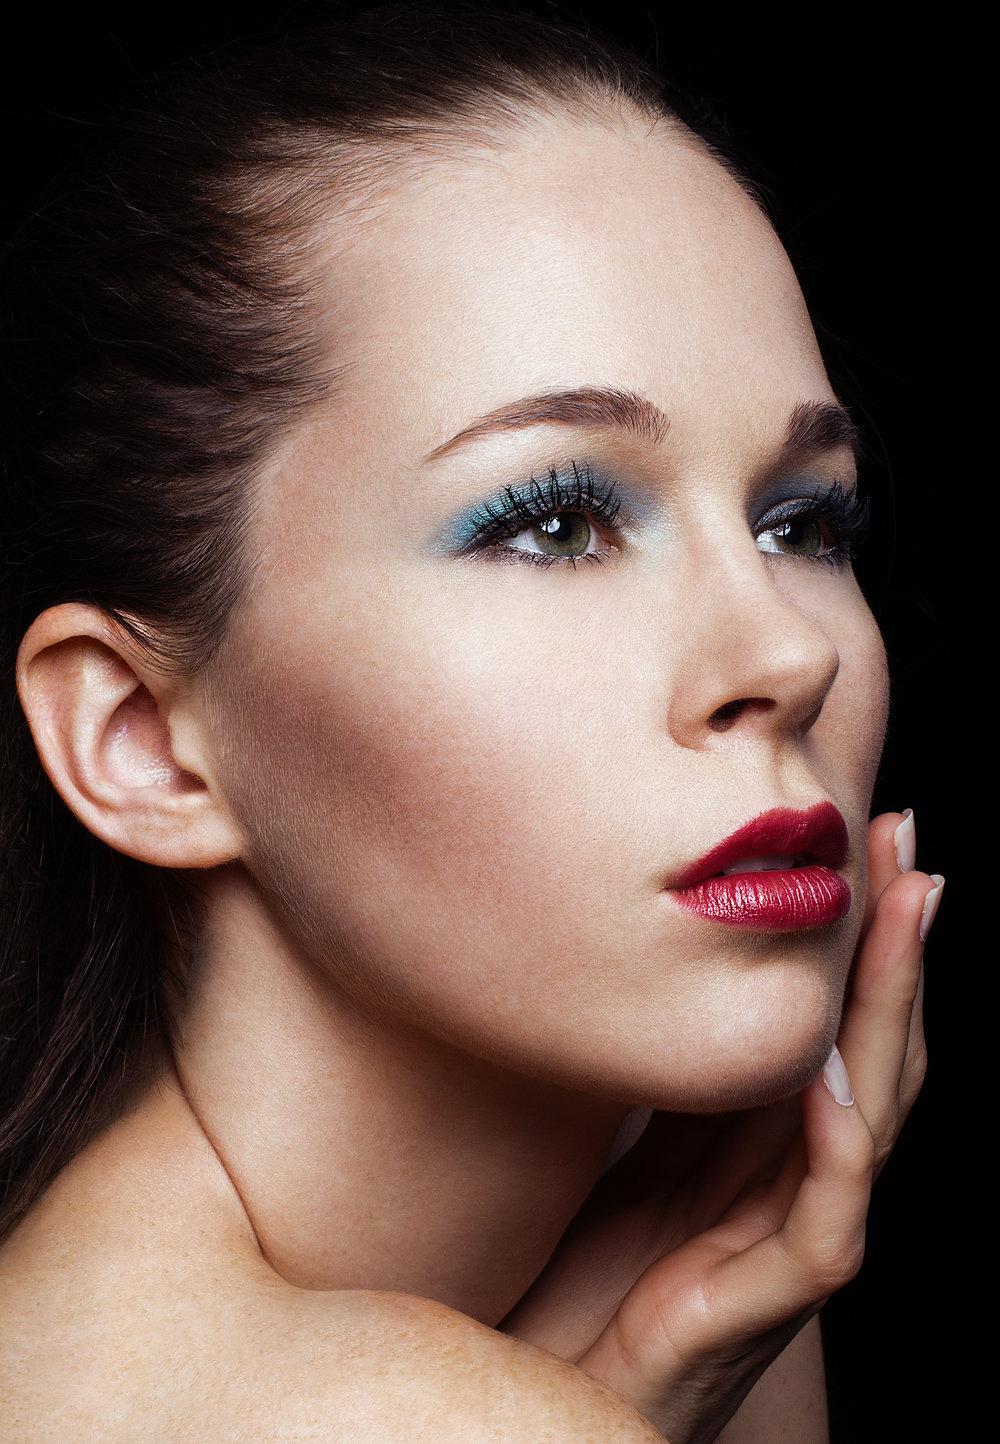 Heather Beauty Shoot-1-Recovered.jpg